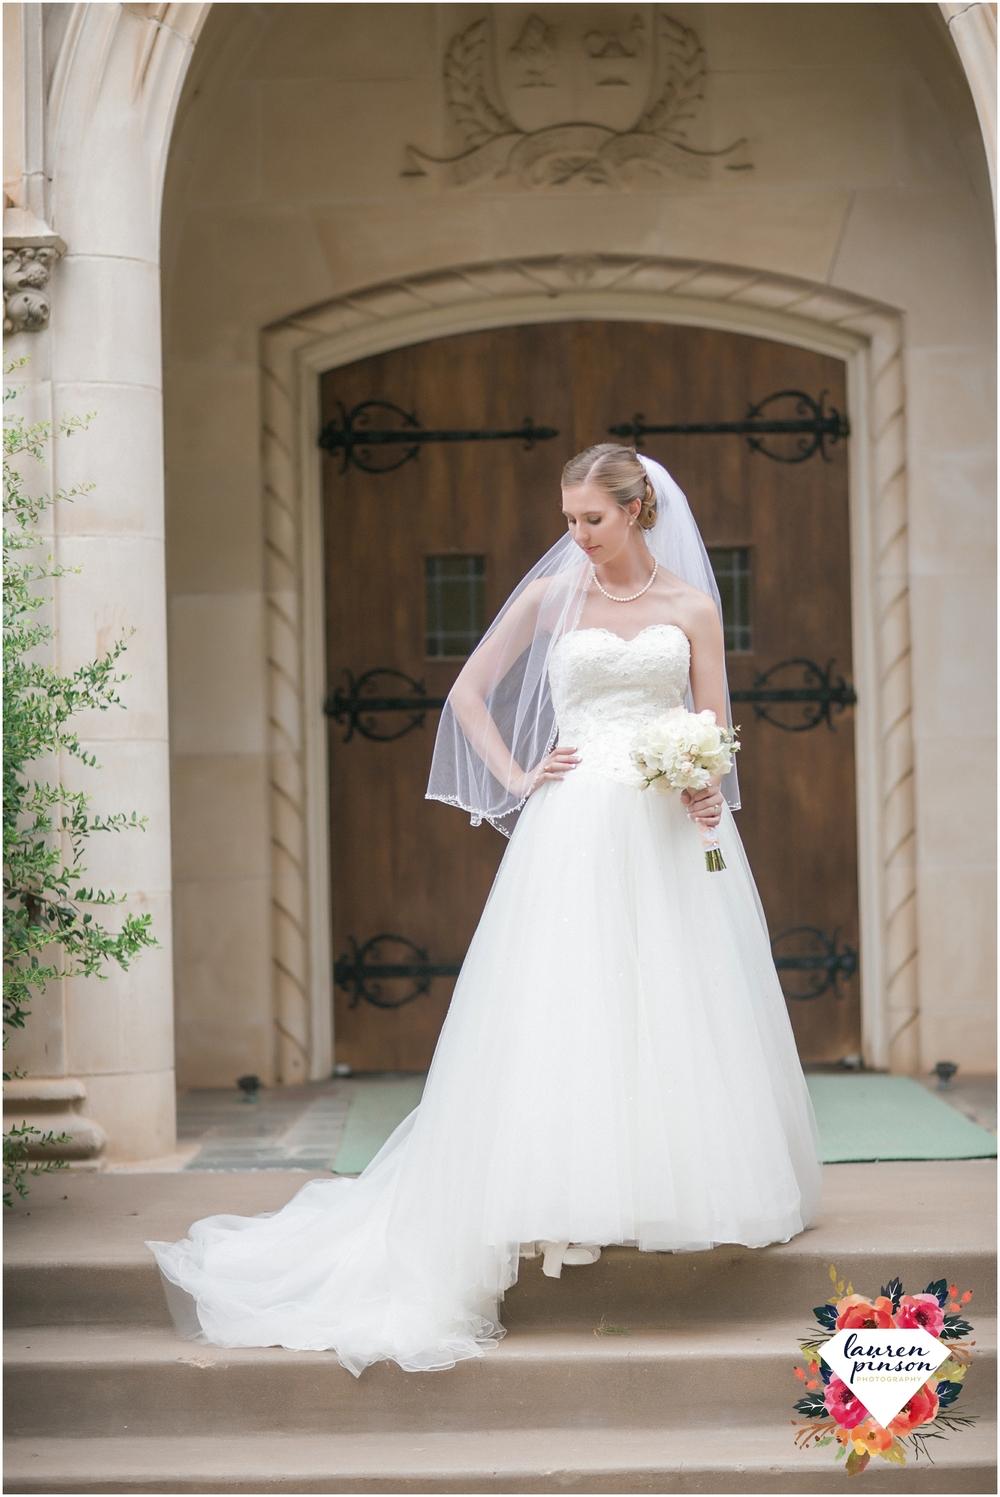 wichita-falls-wedding-photography-at-fain-presbyterian-church-and-the-wellington-timeless-classic-modern-photographer_1124.jpg